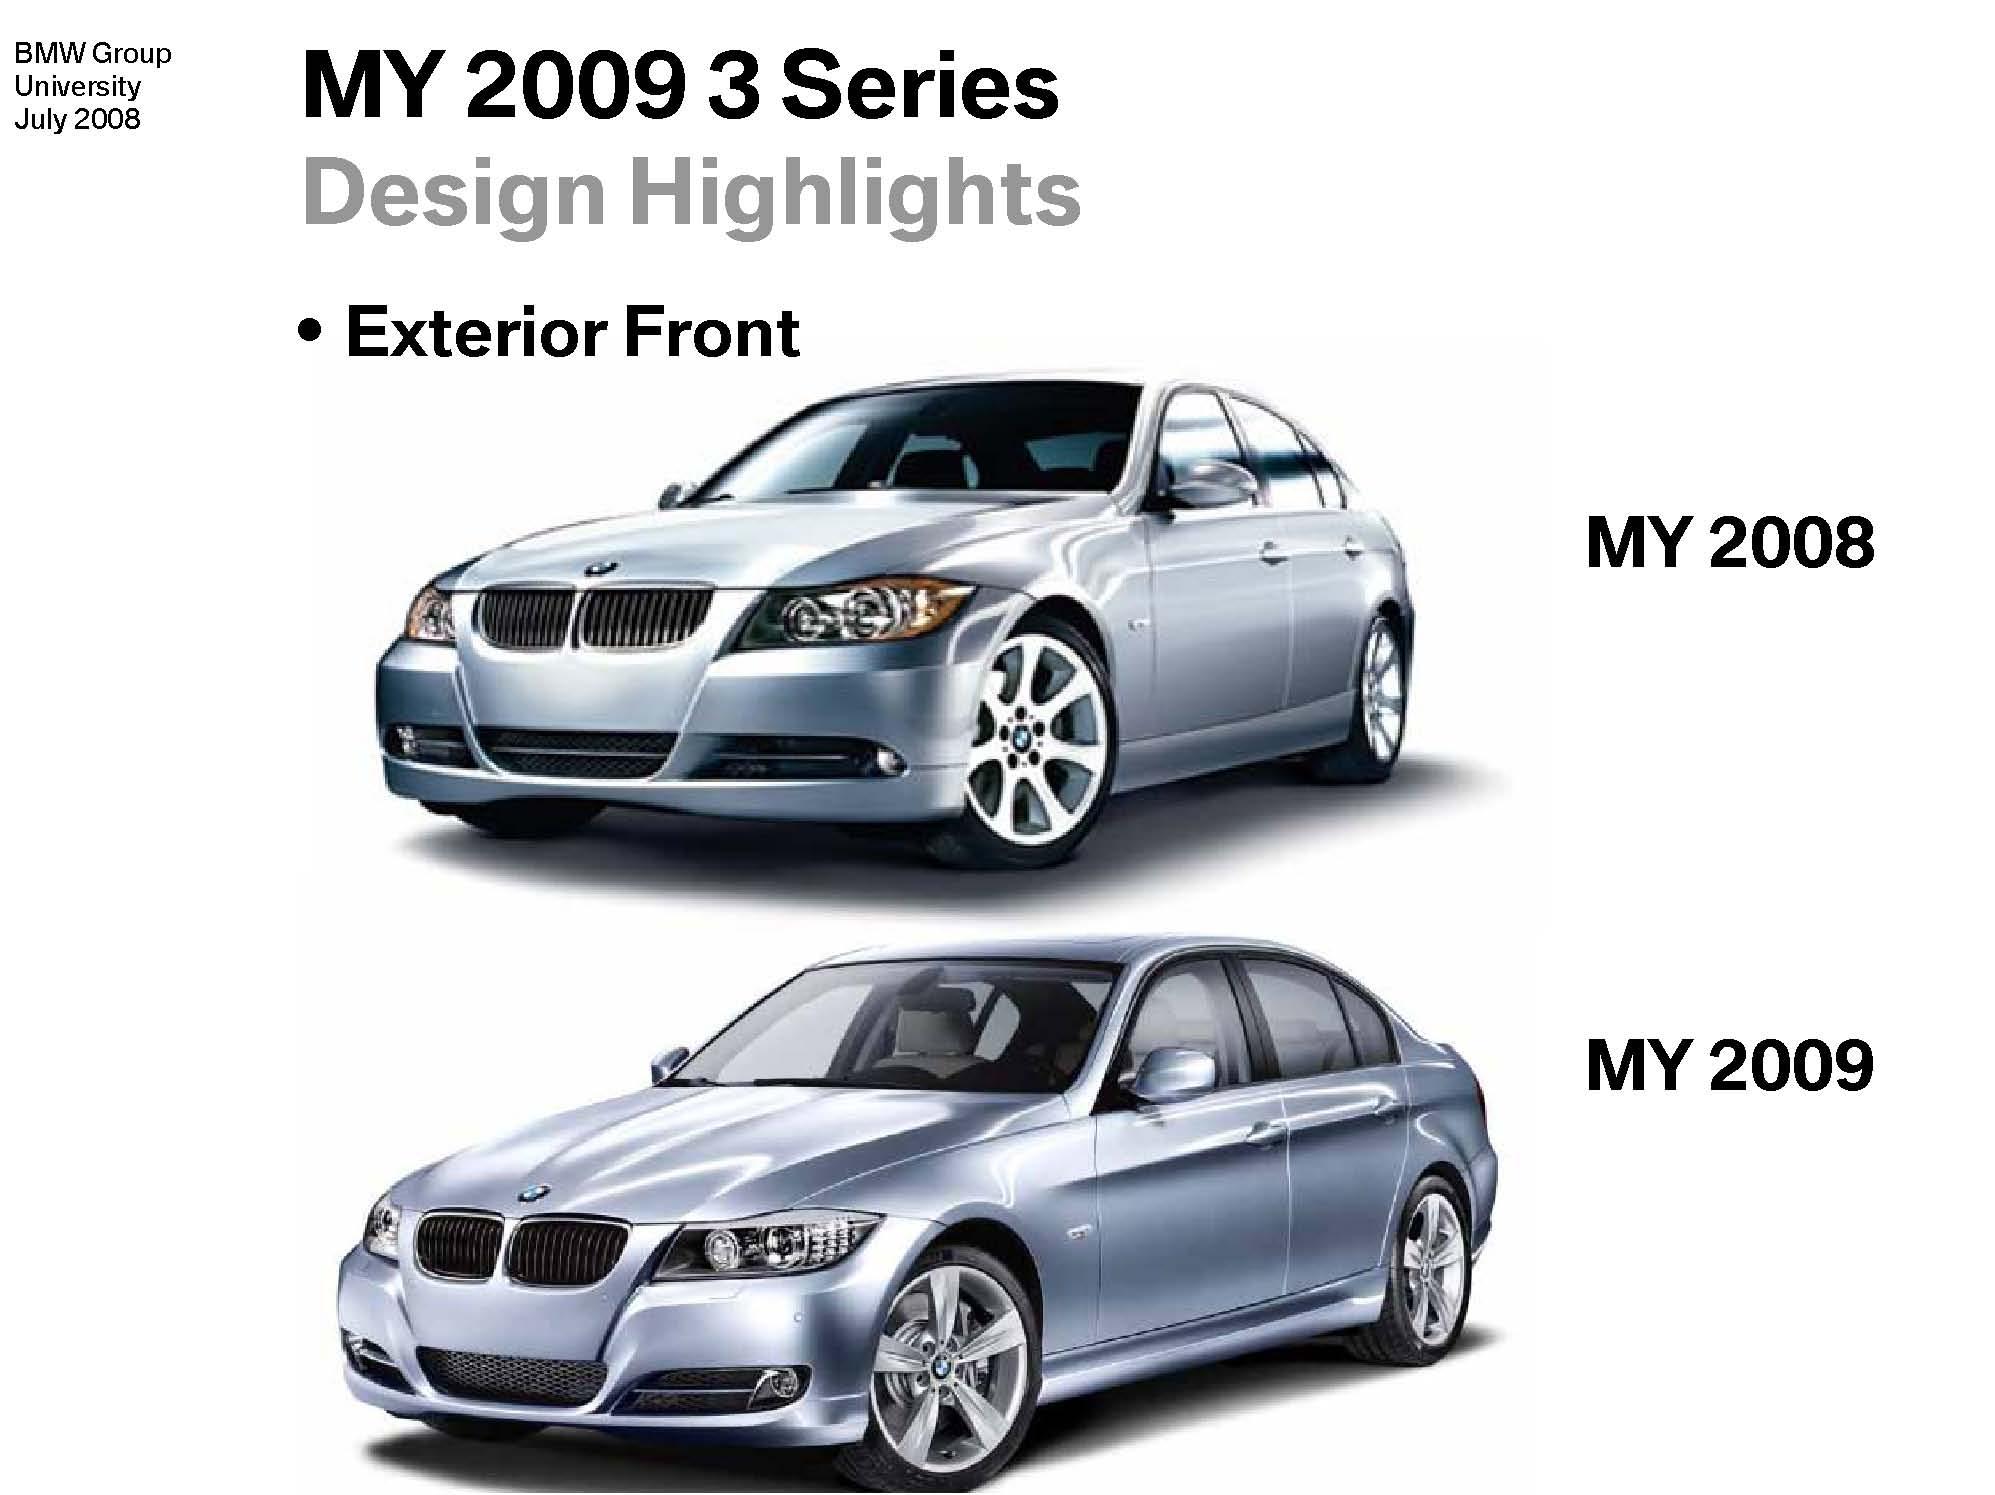 2009 Bmw 3 Series Image 4